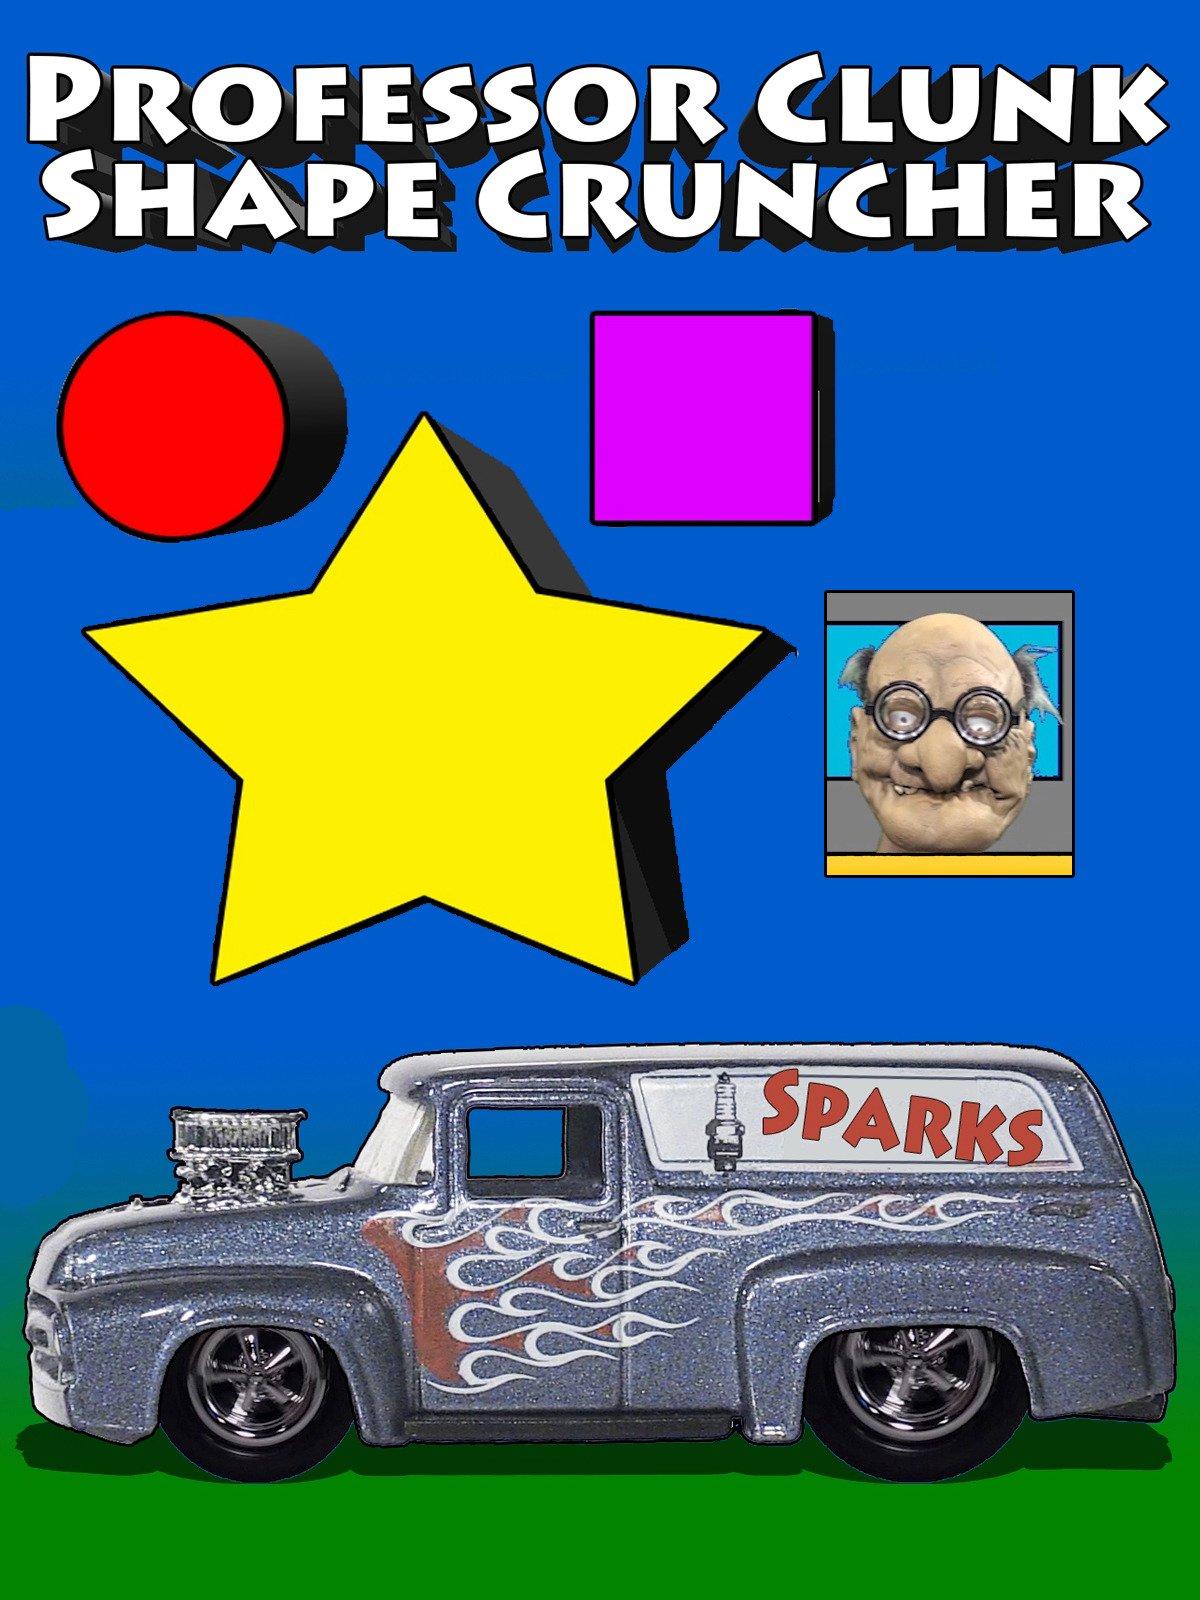 Professor Clunk Shape Cruncher